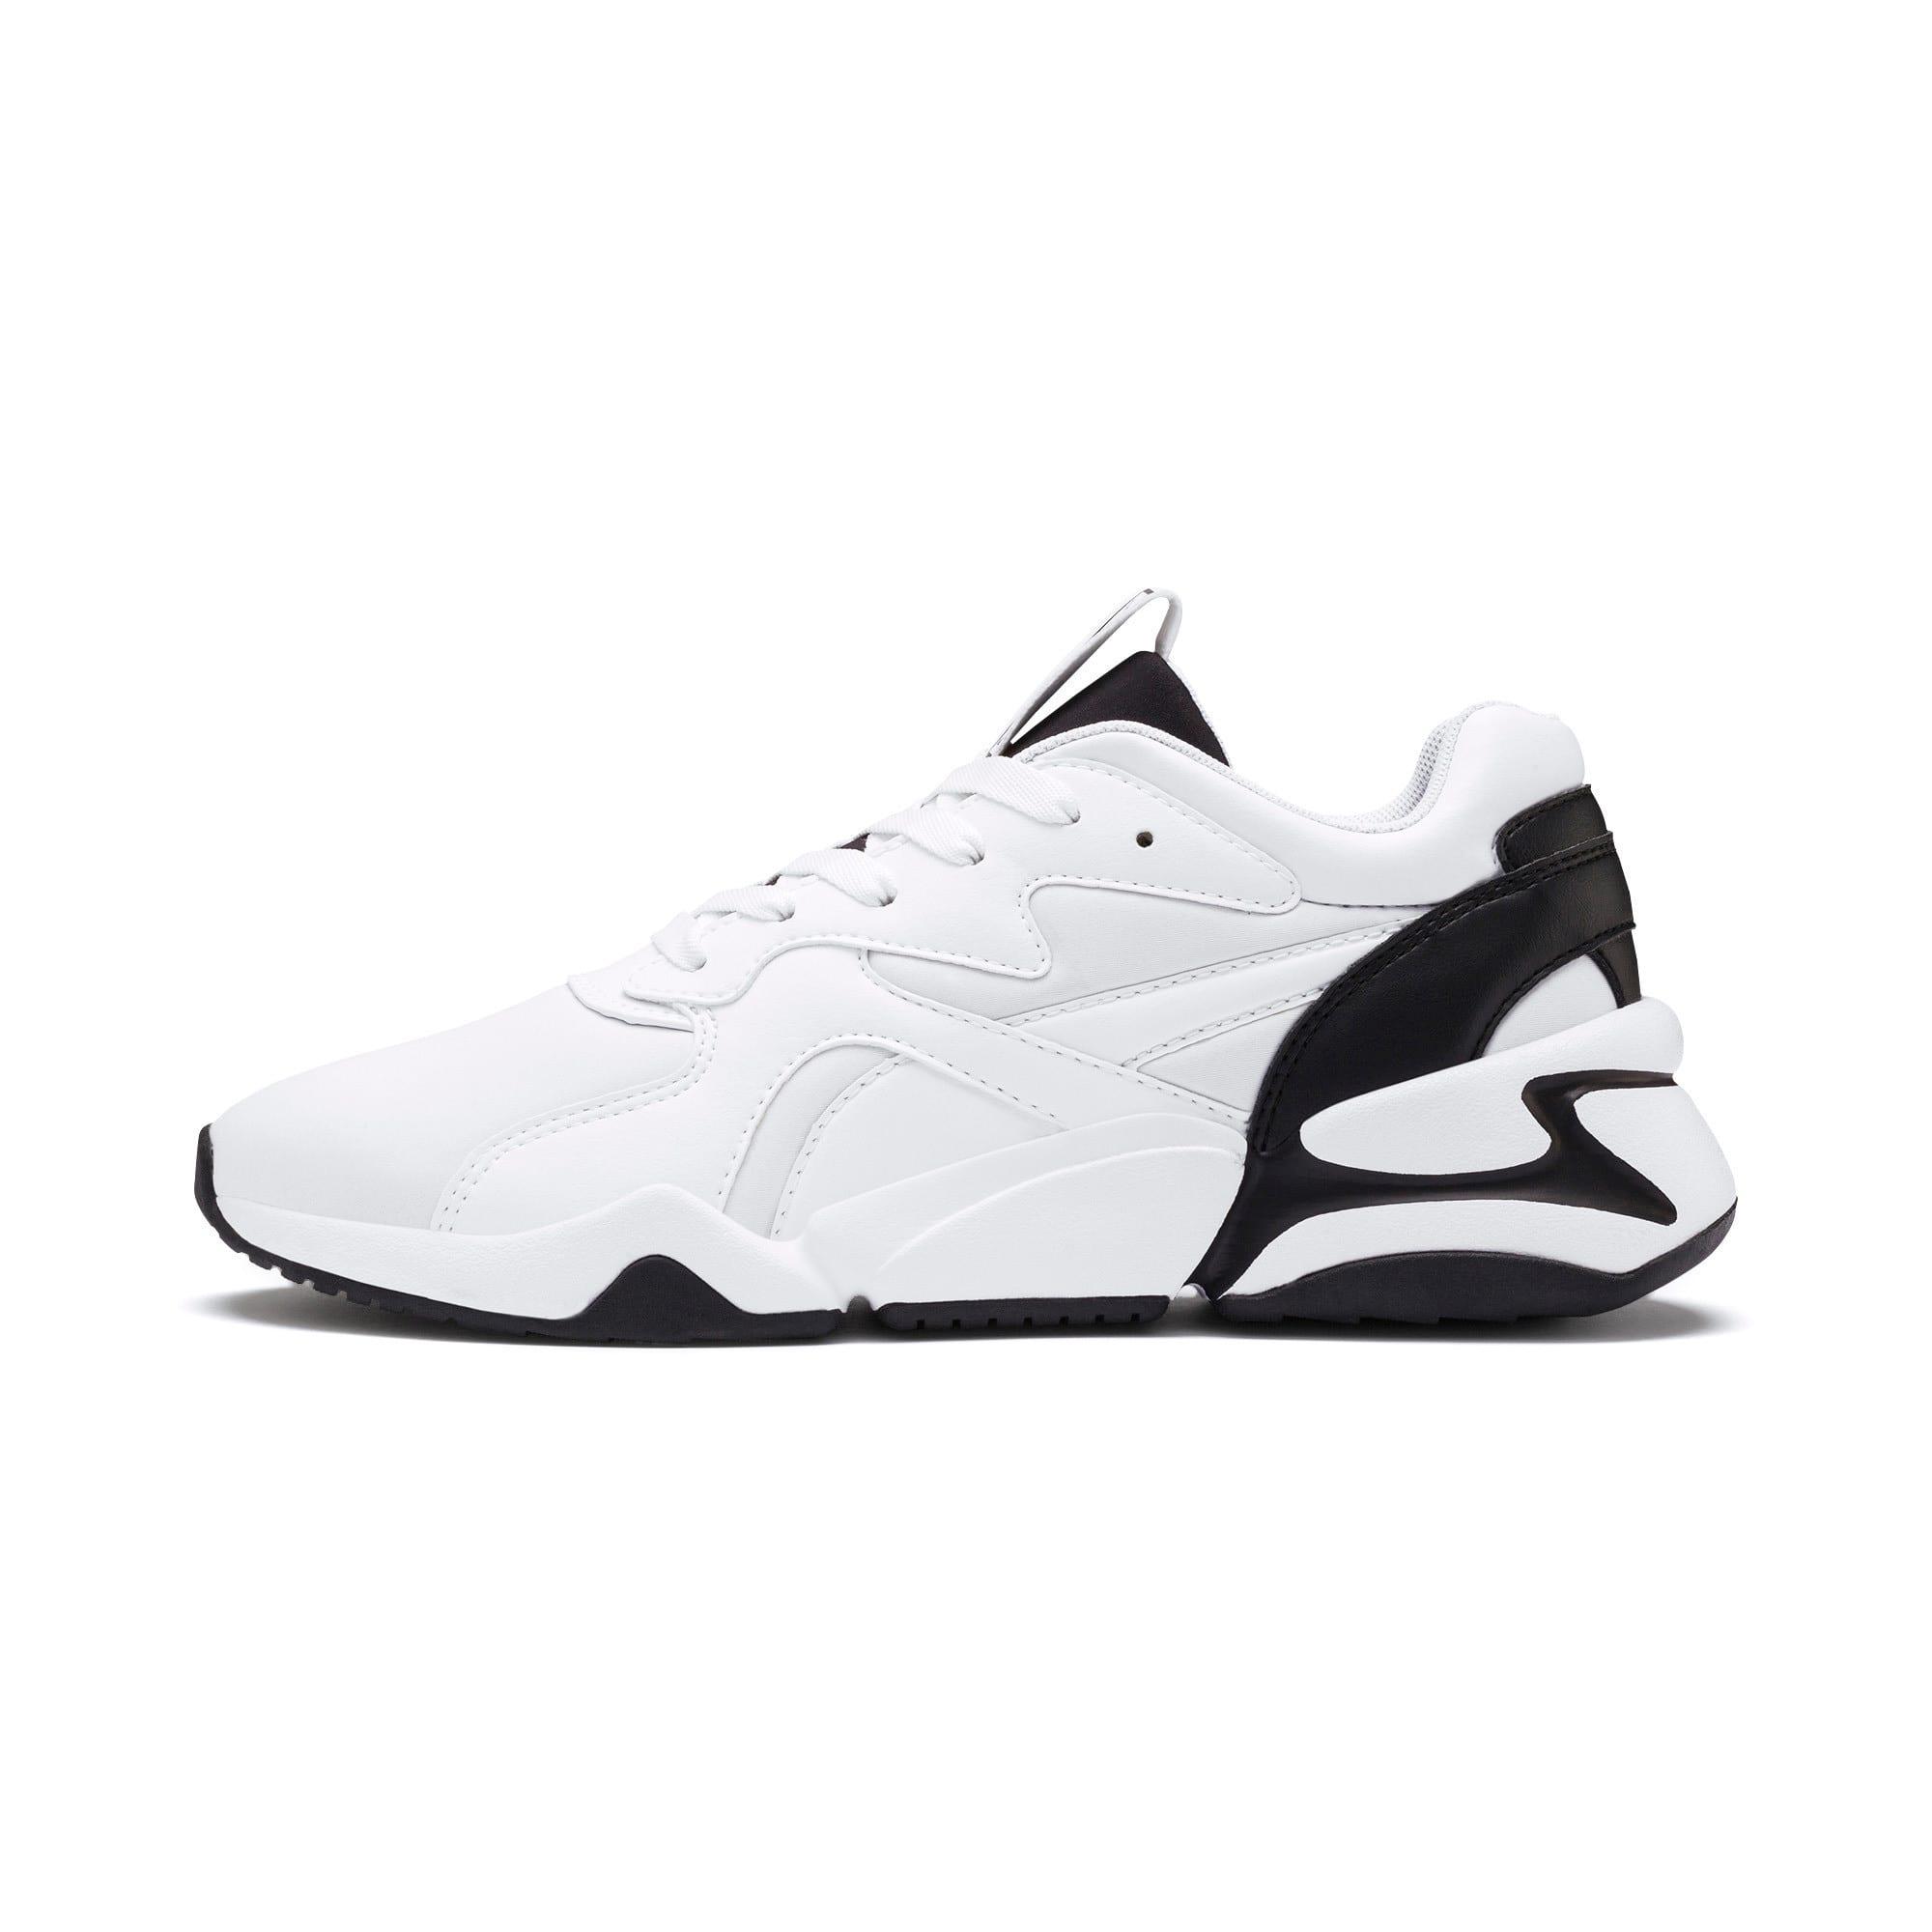 Thumbnail 1 of Nova Women's Sneakers, Puma White-Puma Black, medium